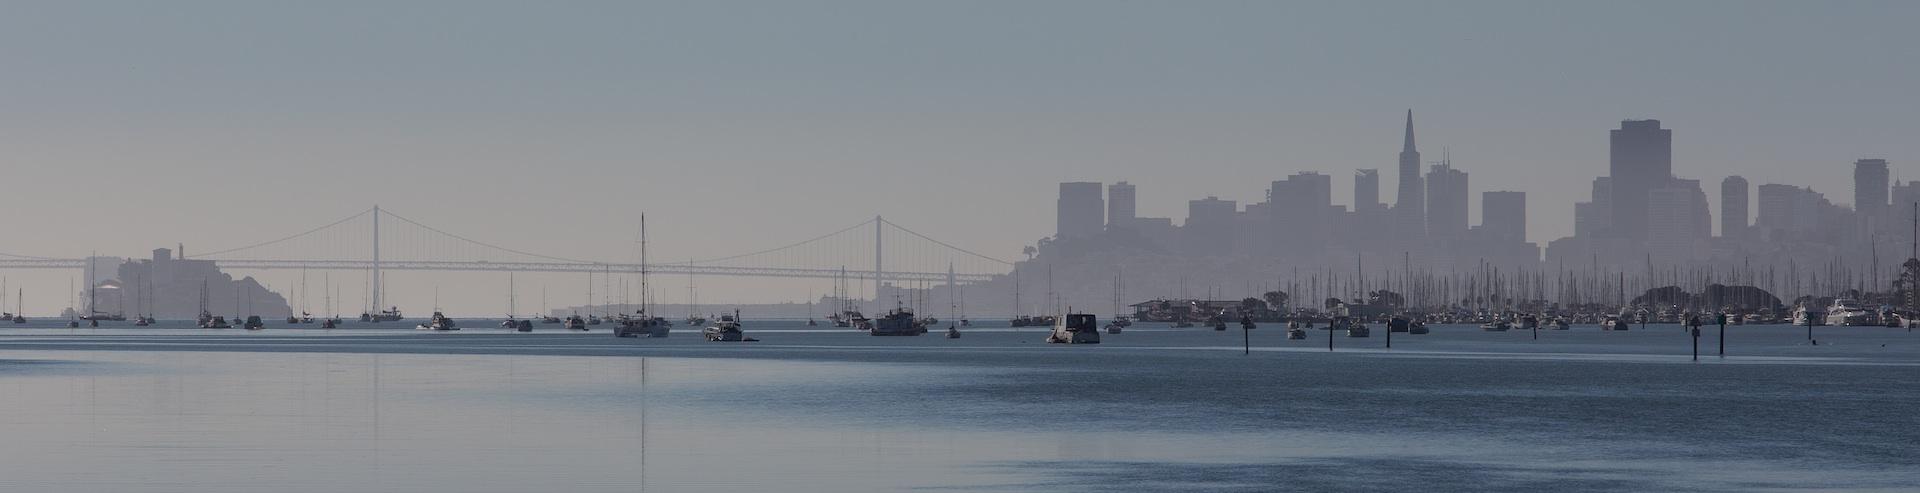 San Francisco Skyline mal anders